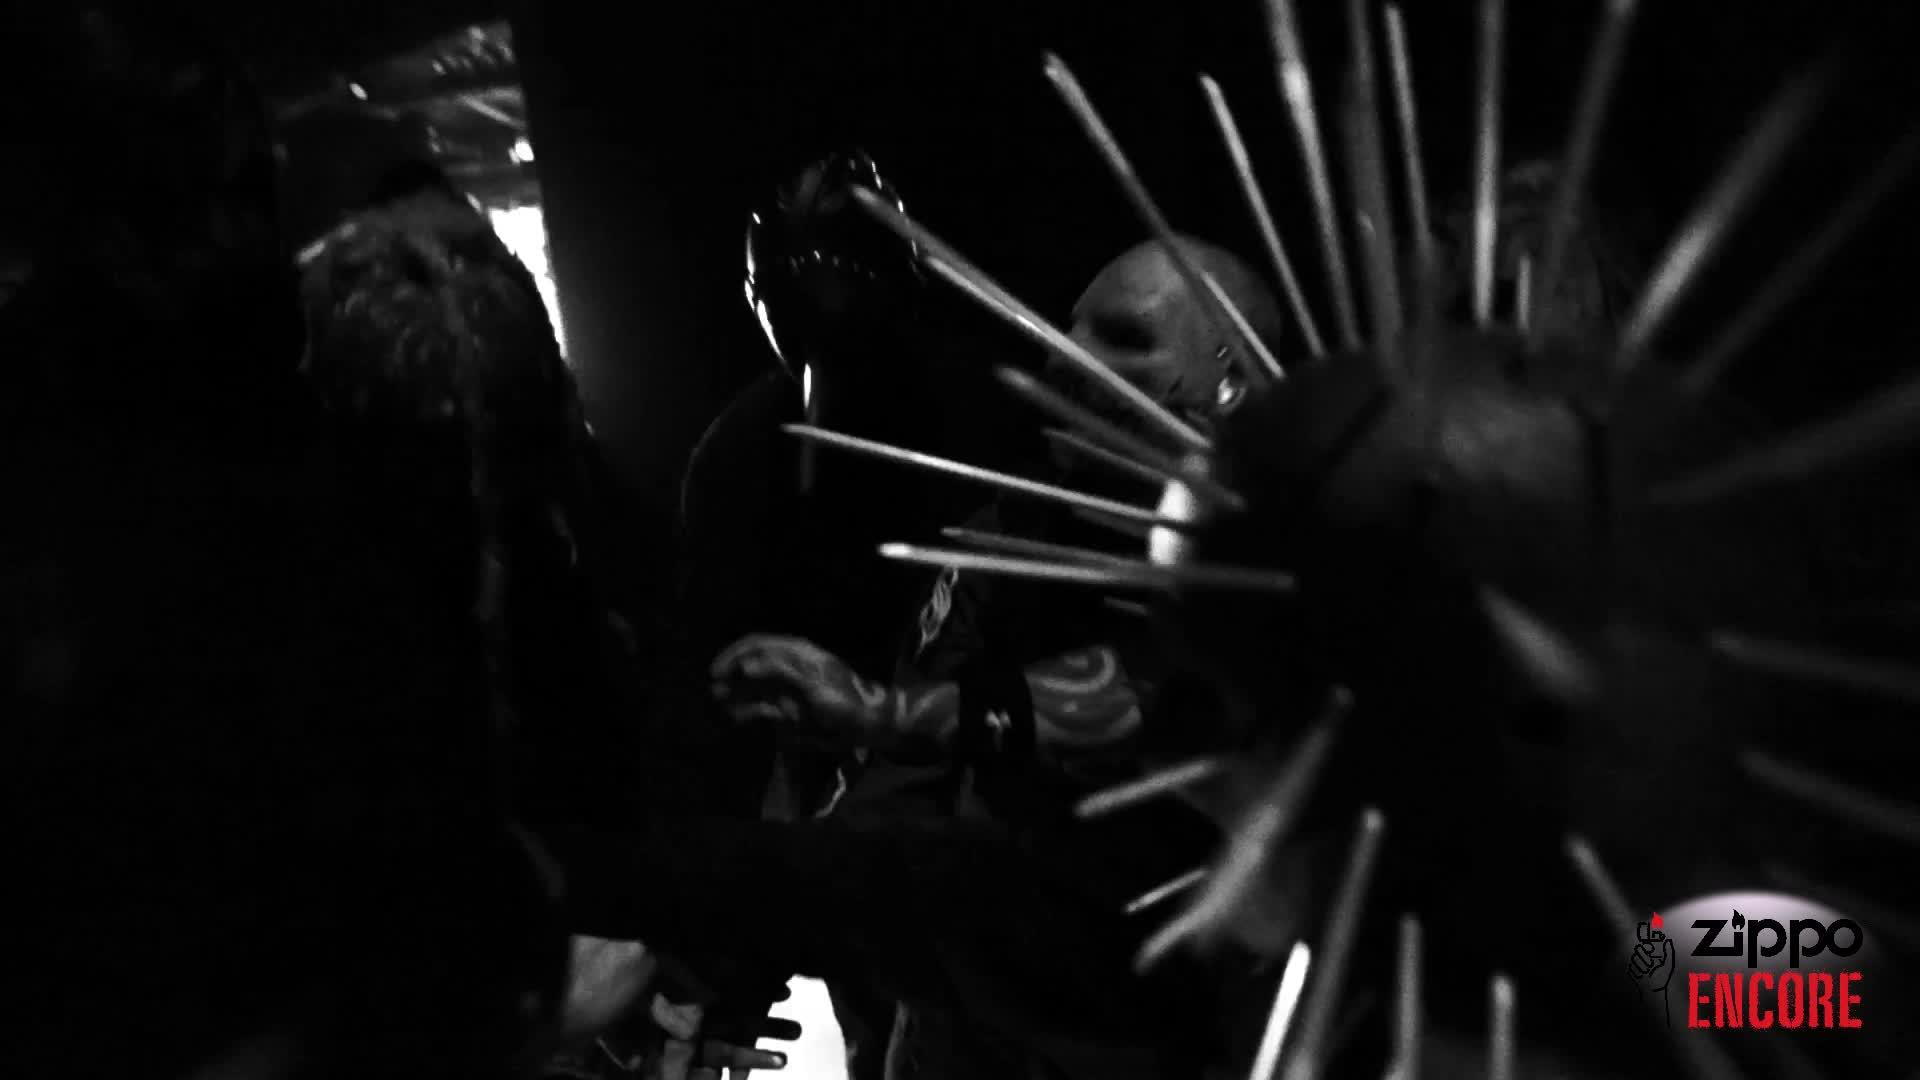 Zippo Encore Unmasks Partnership With Slipknot For 2015 Summer Tour Dates